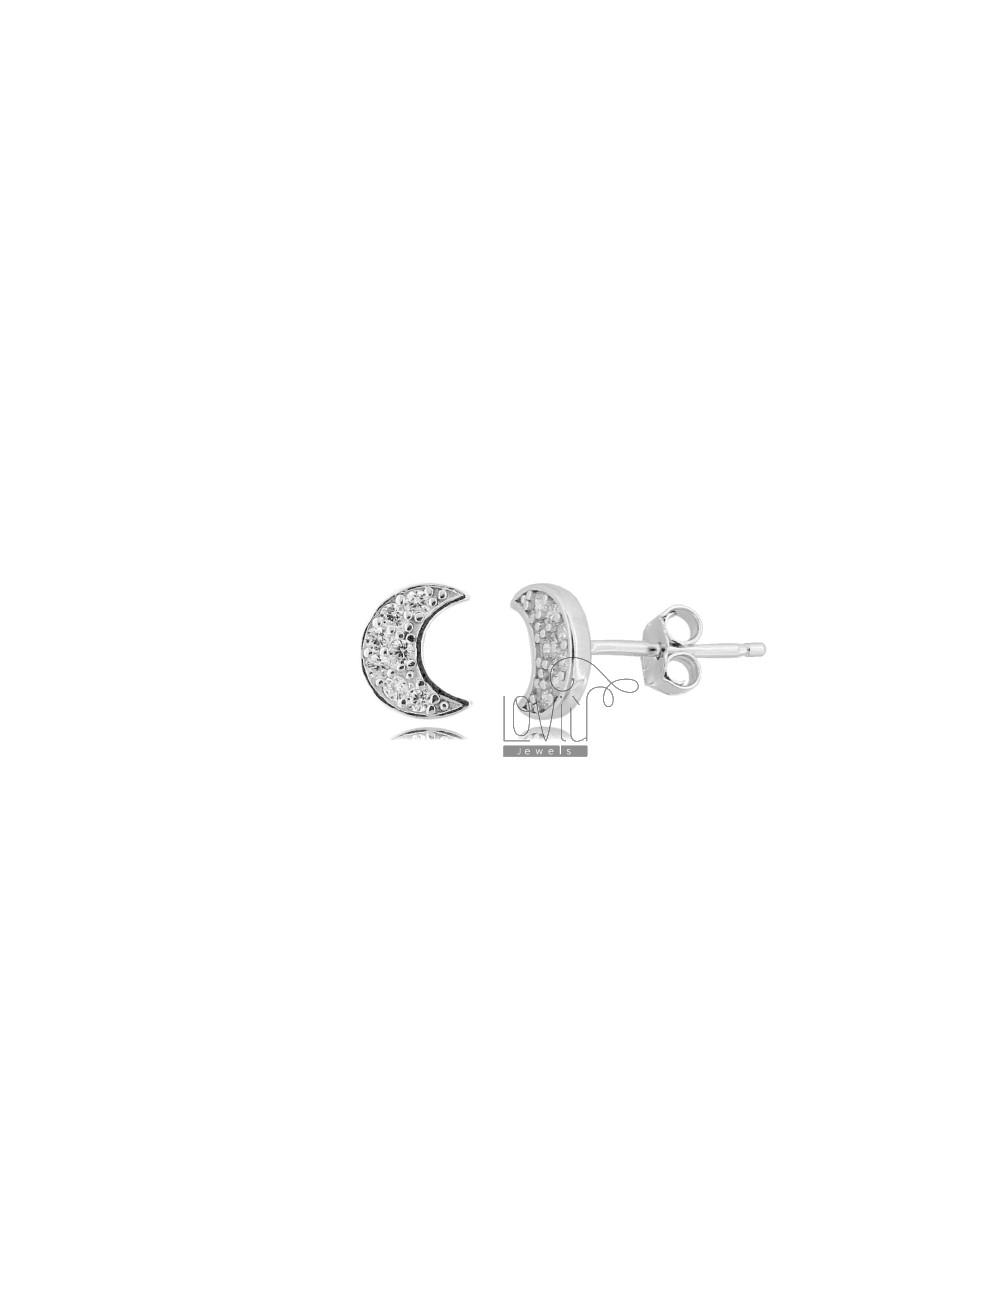 LOBO LUNA EARRINGS 8X6 MM SILVER RHODIUM TIT 925 AND WHITE ZIRCONIA